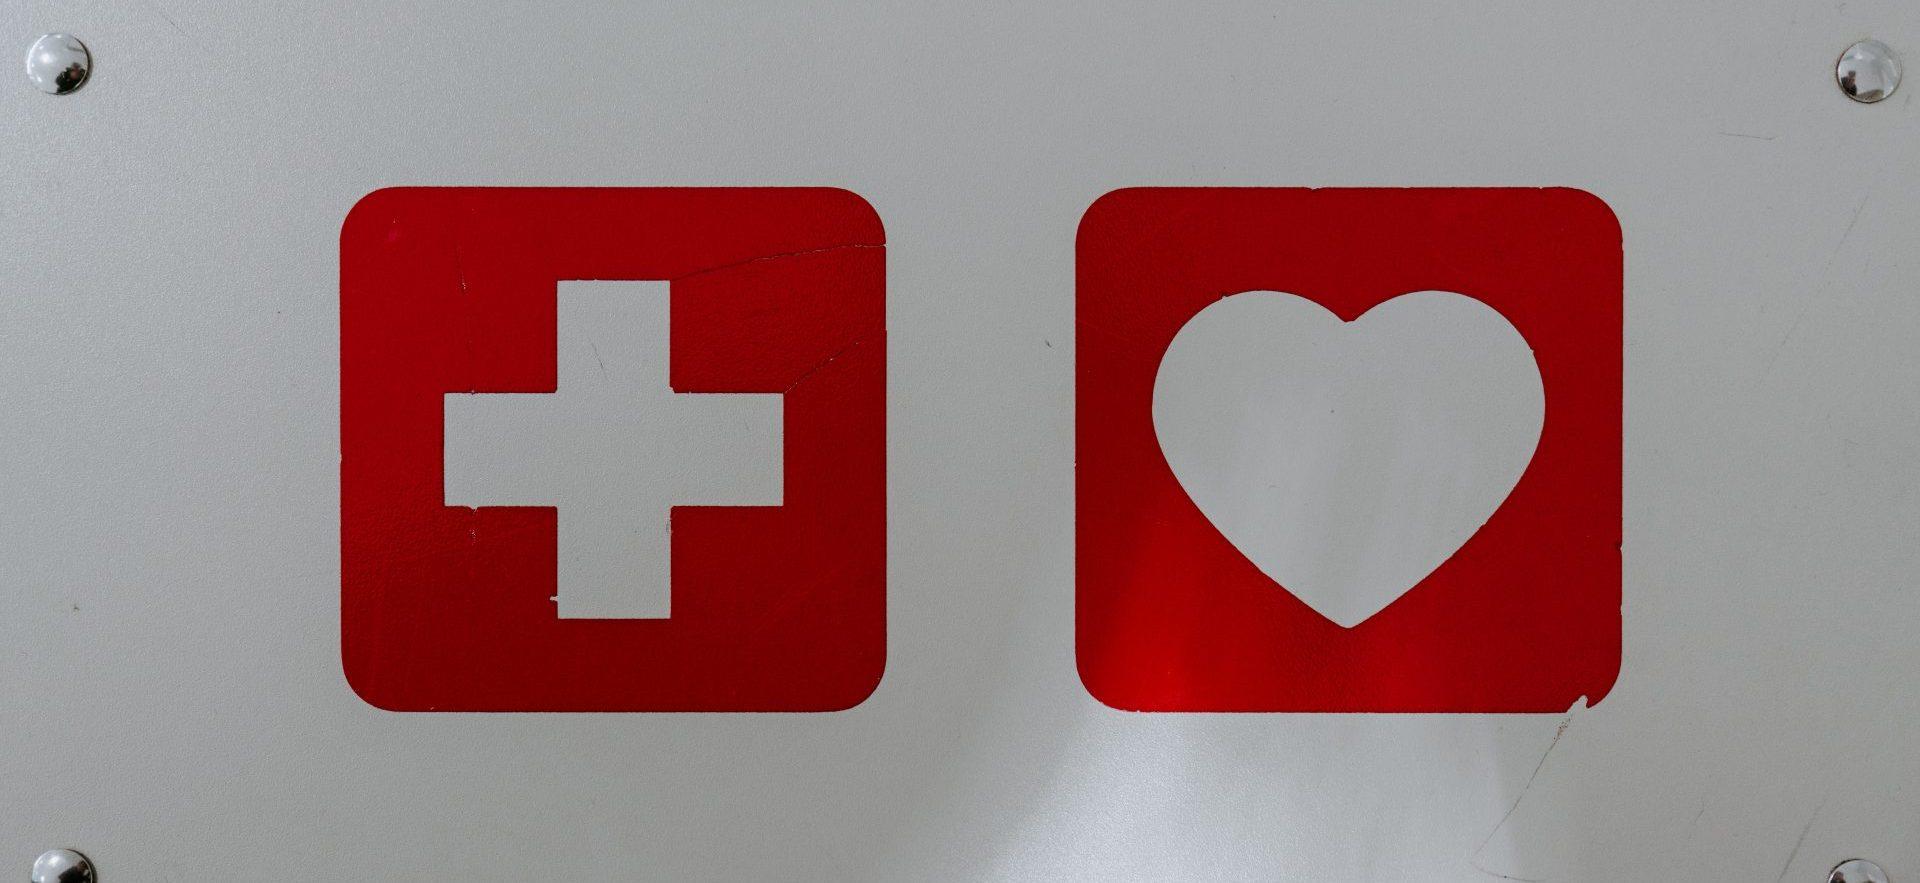 First aid aspect ratio 100x46